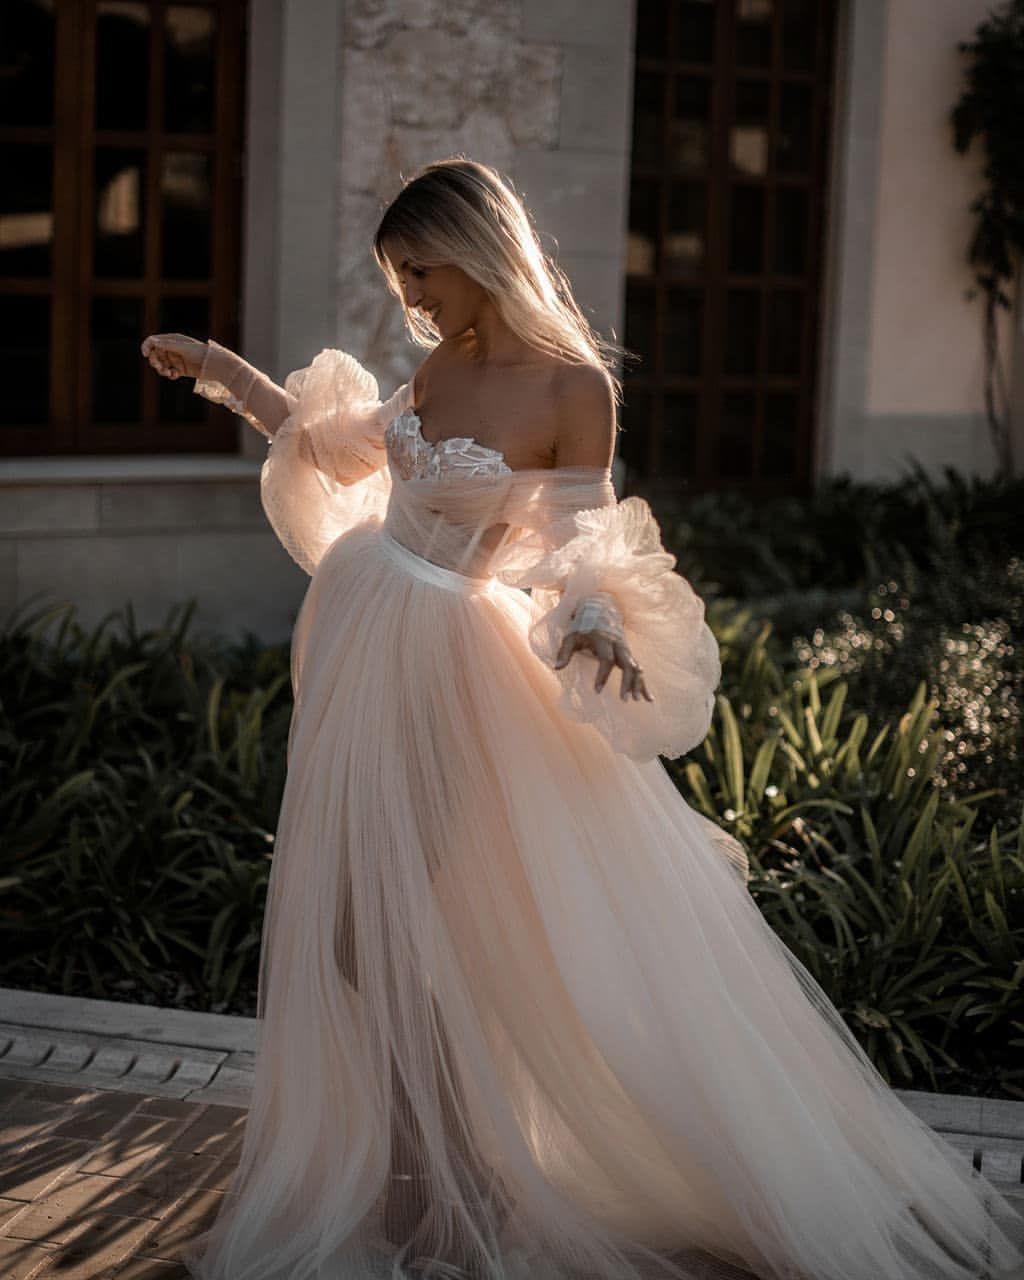 For More Visit Jolygram Jolygram Com Jolygram Instagram Instaview Long Wedding Dresses Bridal Dresses Tulle Wedding Dress